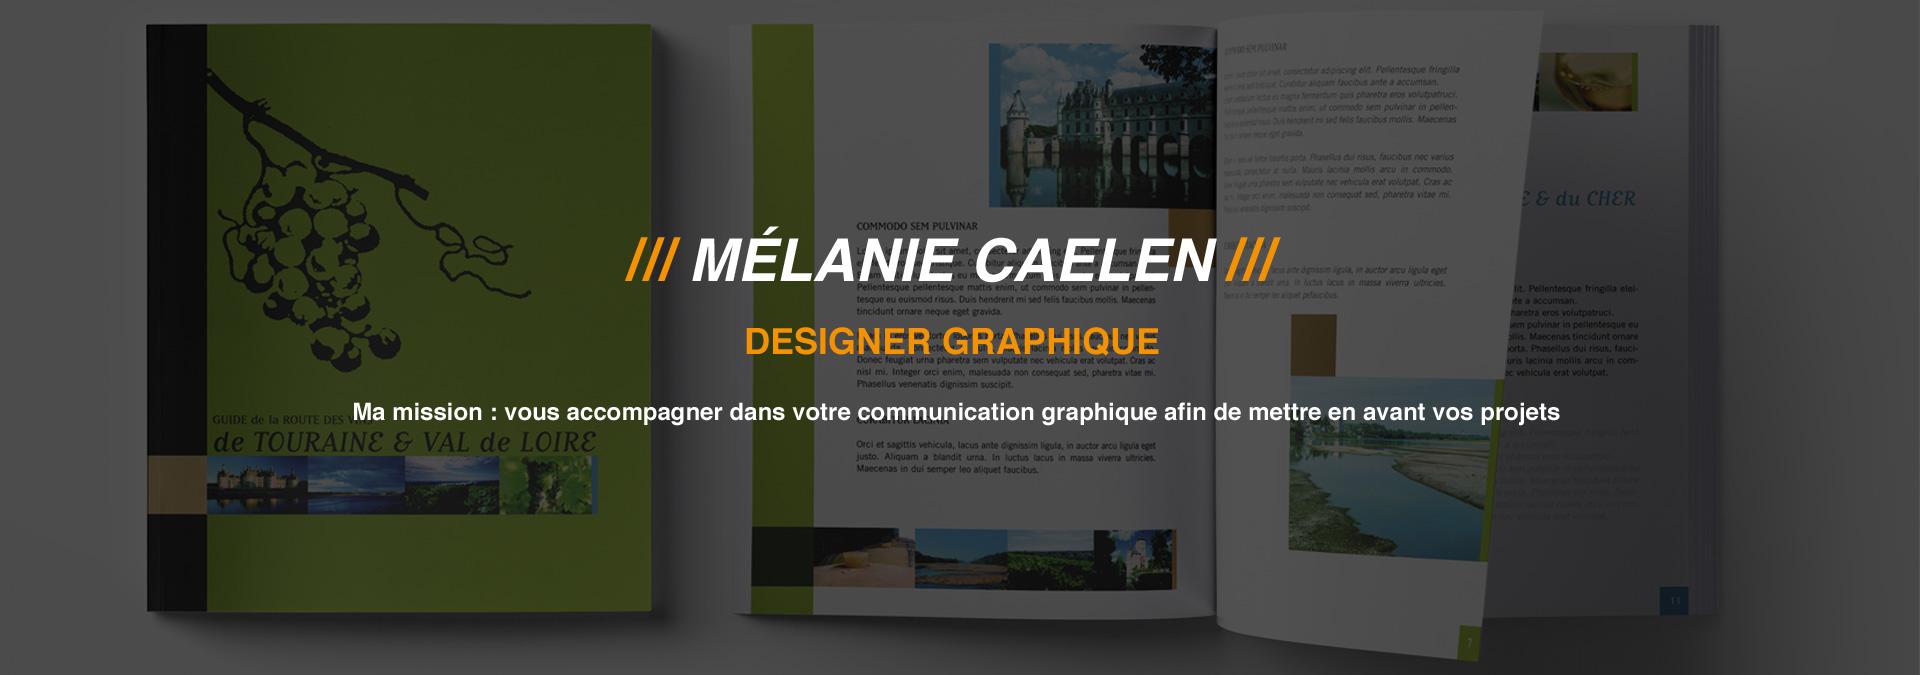 Mélanie Ceelen - designer graphique